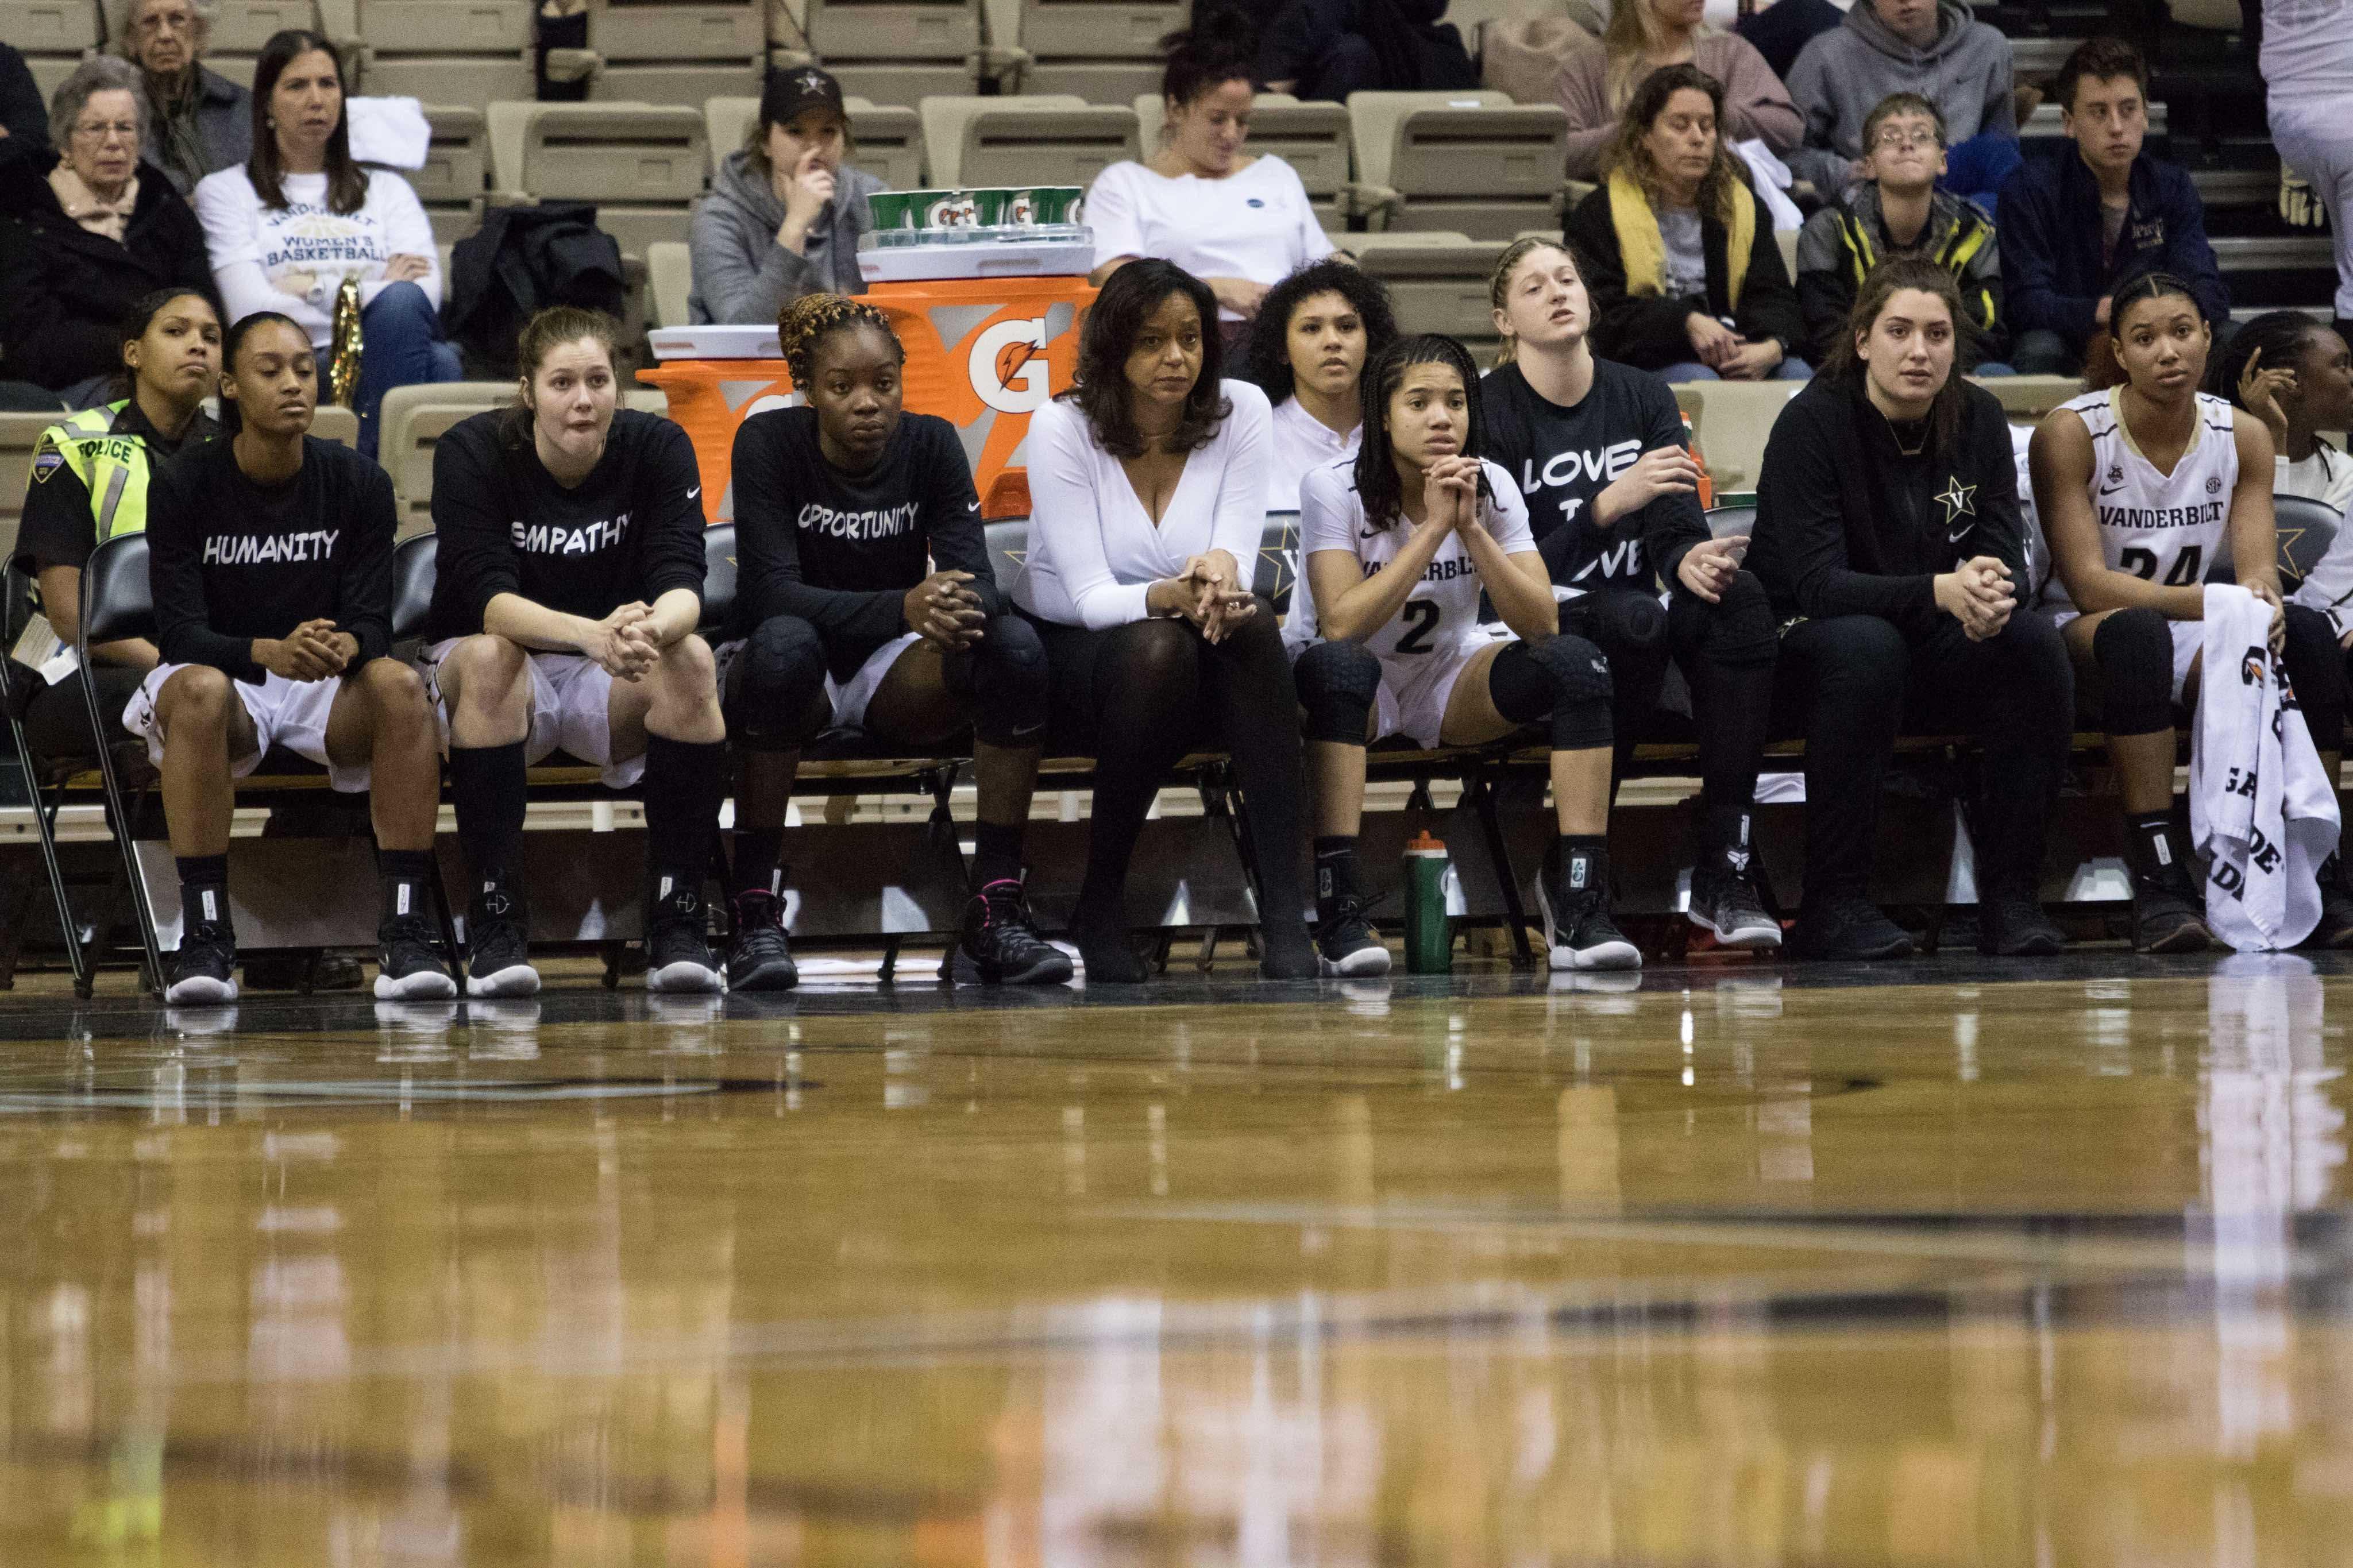 Bigger than basketball: Women's basketball players wear their causes